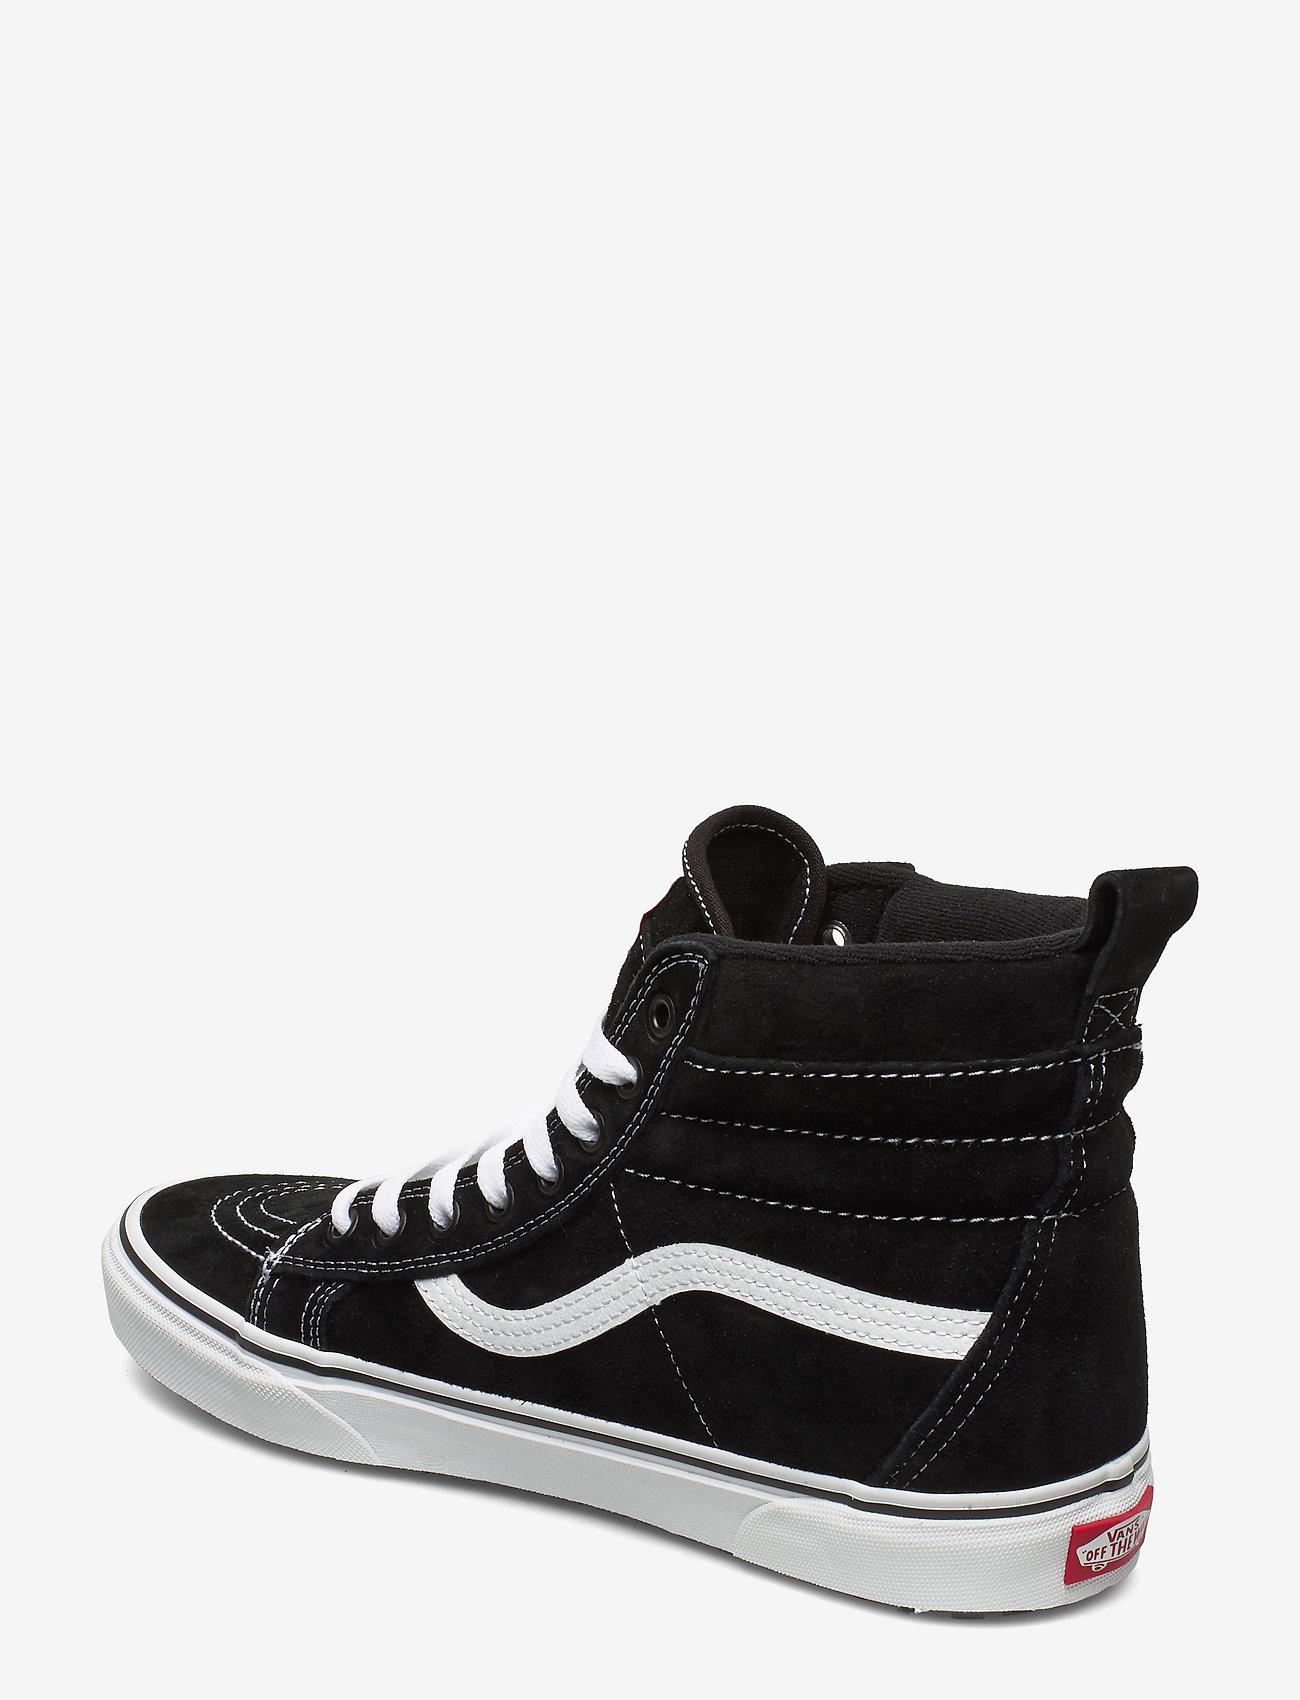 Ua Sk8-hi Mte ((mte) Black/true White) (899 kr) - VANS